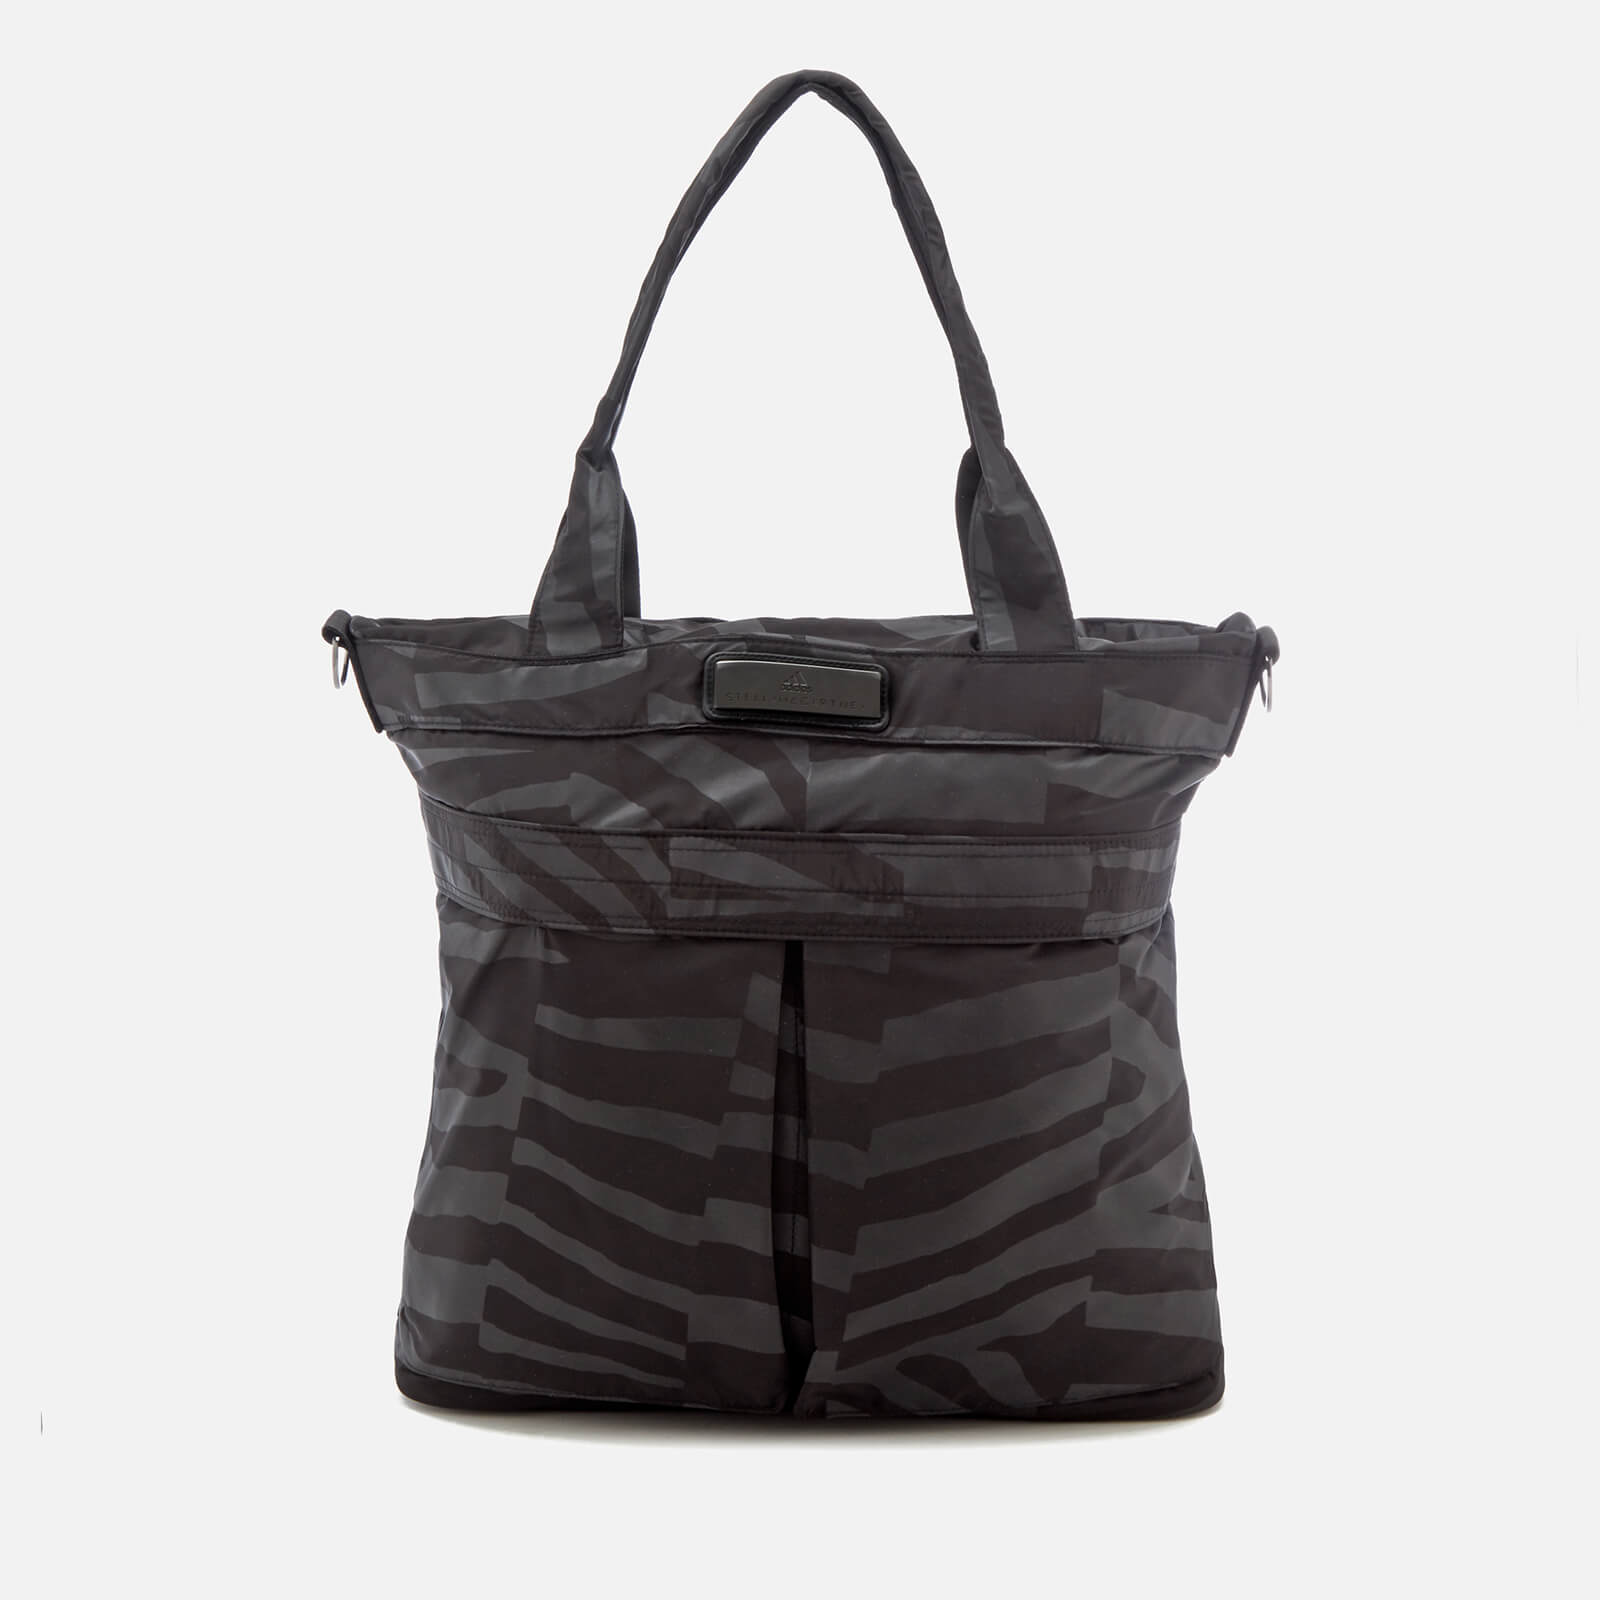 560bfa25 adidas by Stella McCartney Women's Essentials Tote Bag - Black/Gun Metal/ White - Free UK Delivery over £50